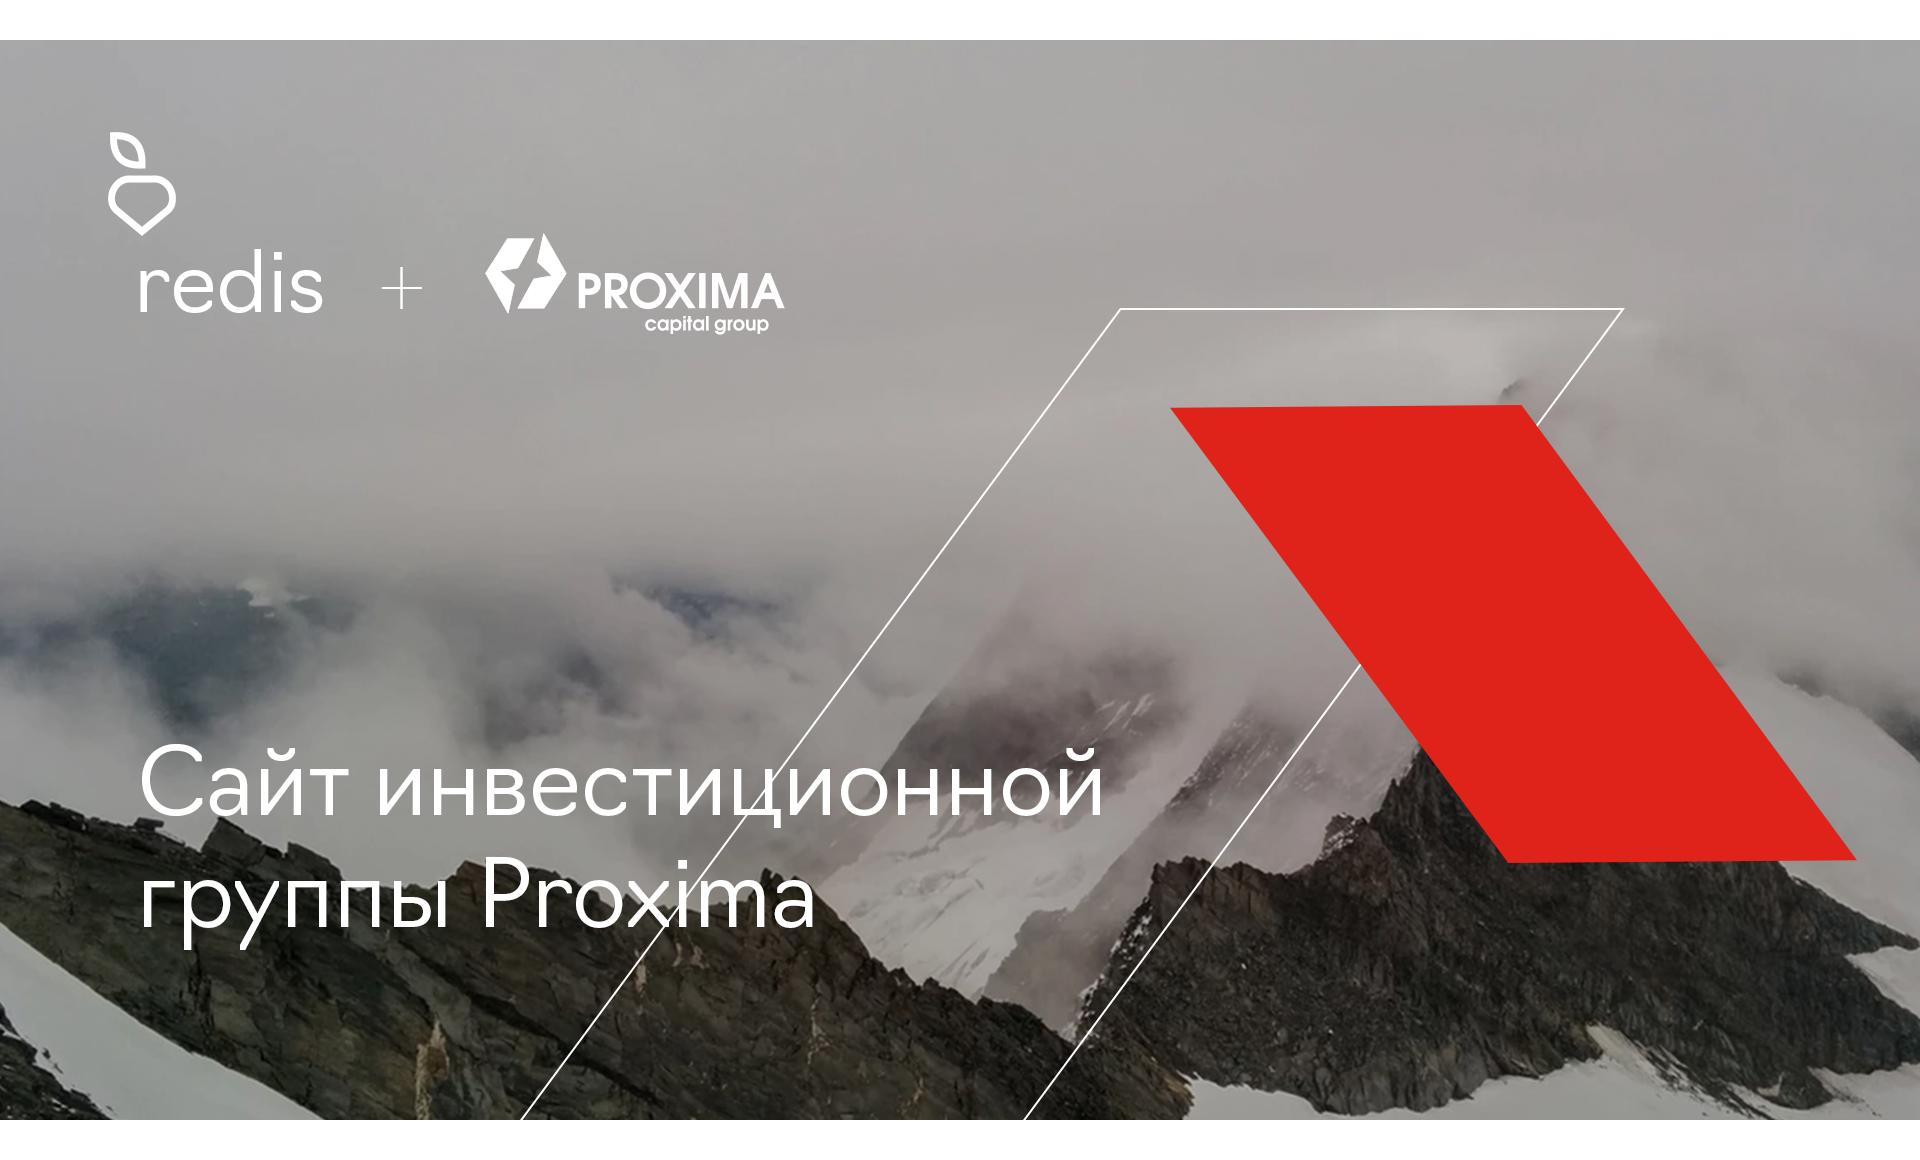 Proxima Capital Group